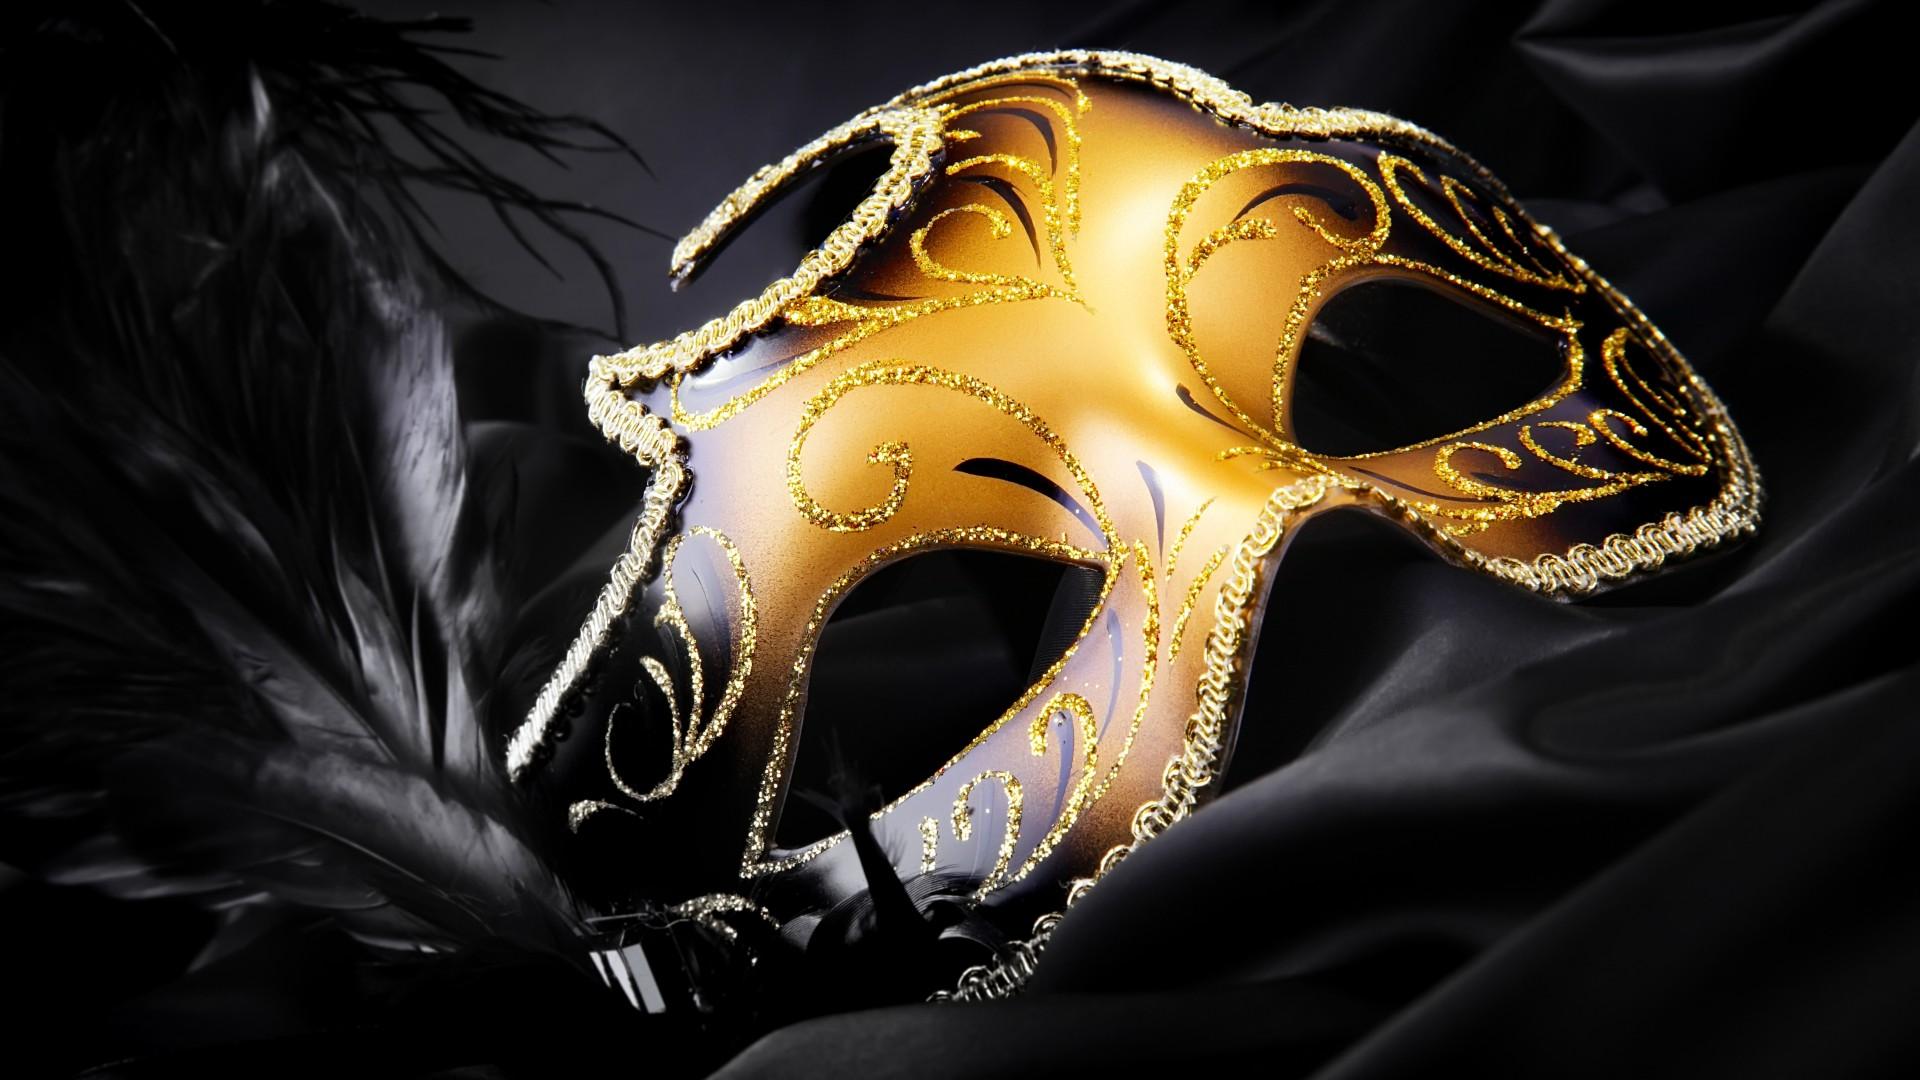 Fall Masquerade Fantasy Art Wallpapers Carnival Backgrounds Free Download Pixelstalk Net